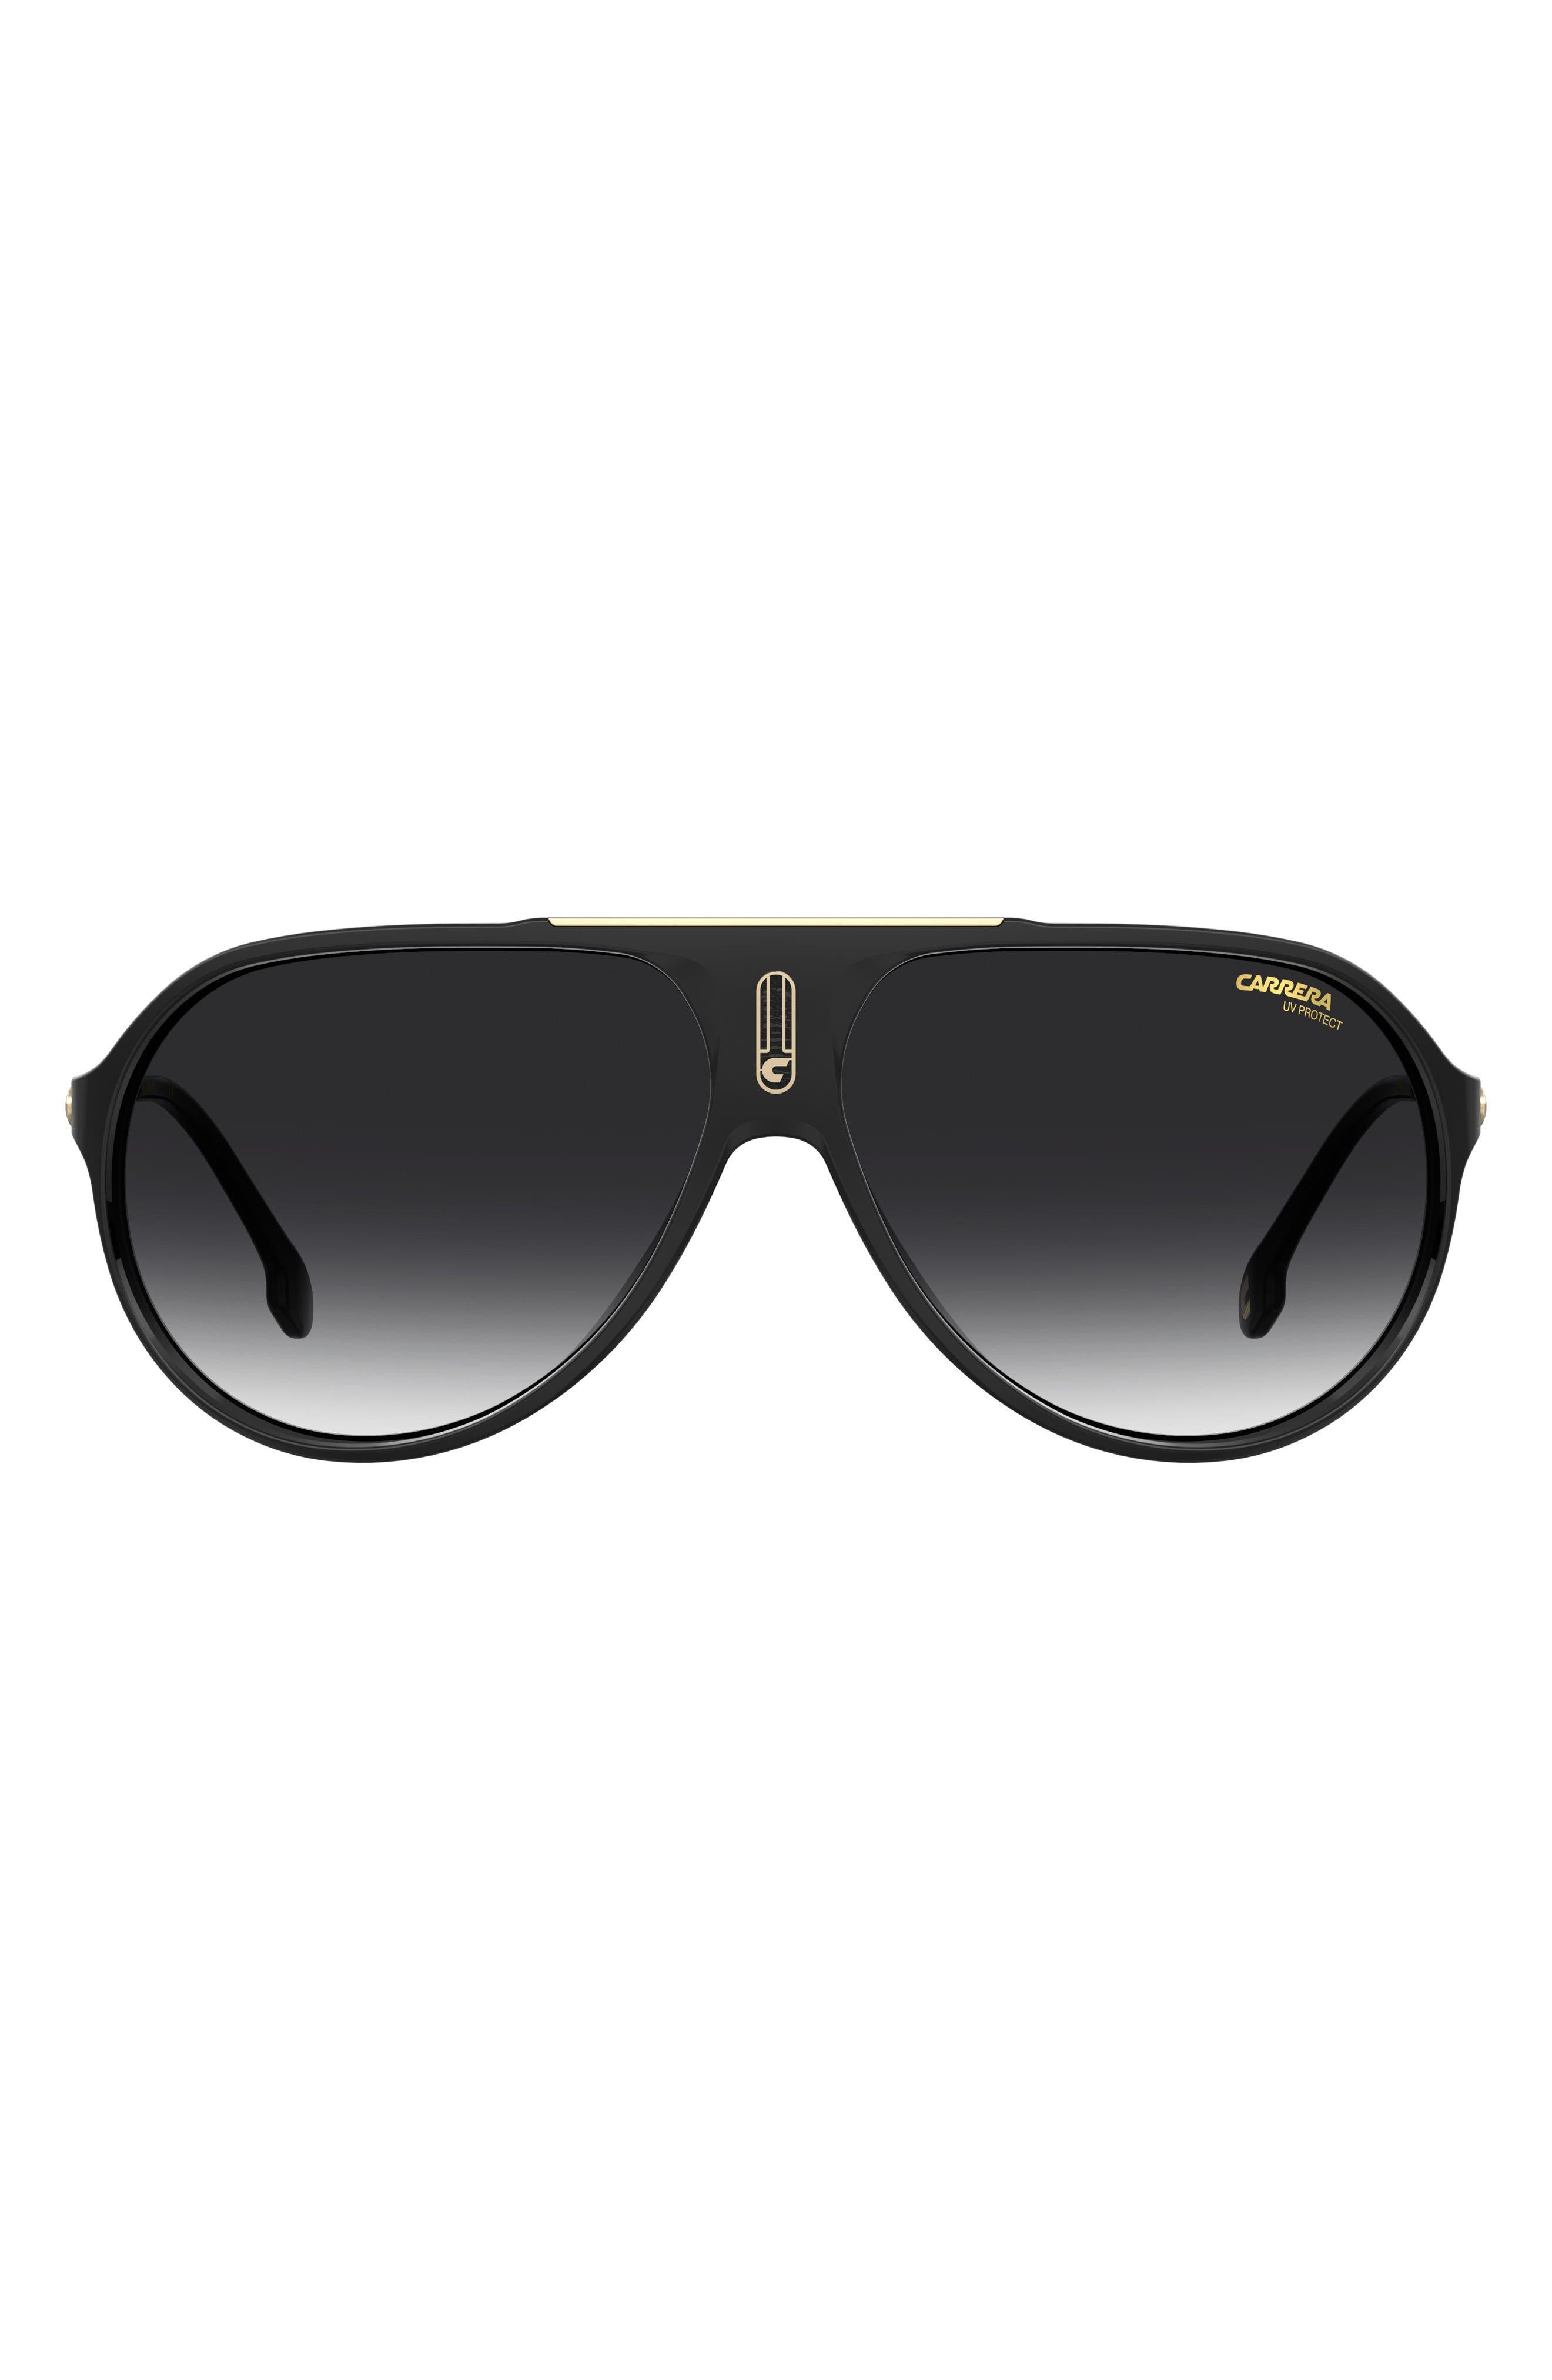 Hot65 63mm Polarized Aviator Sunglasses